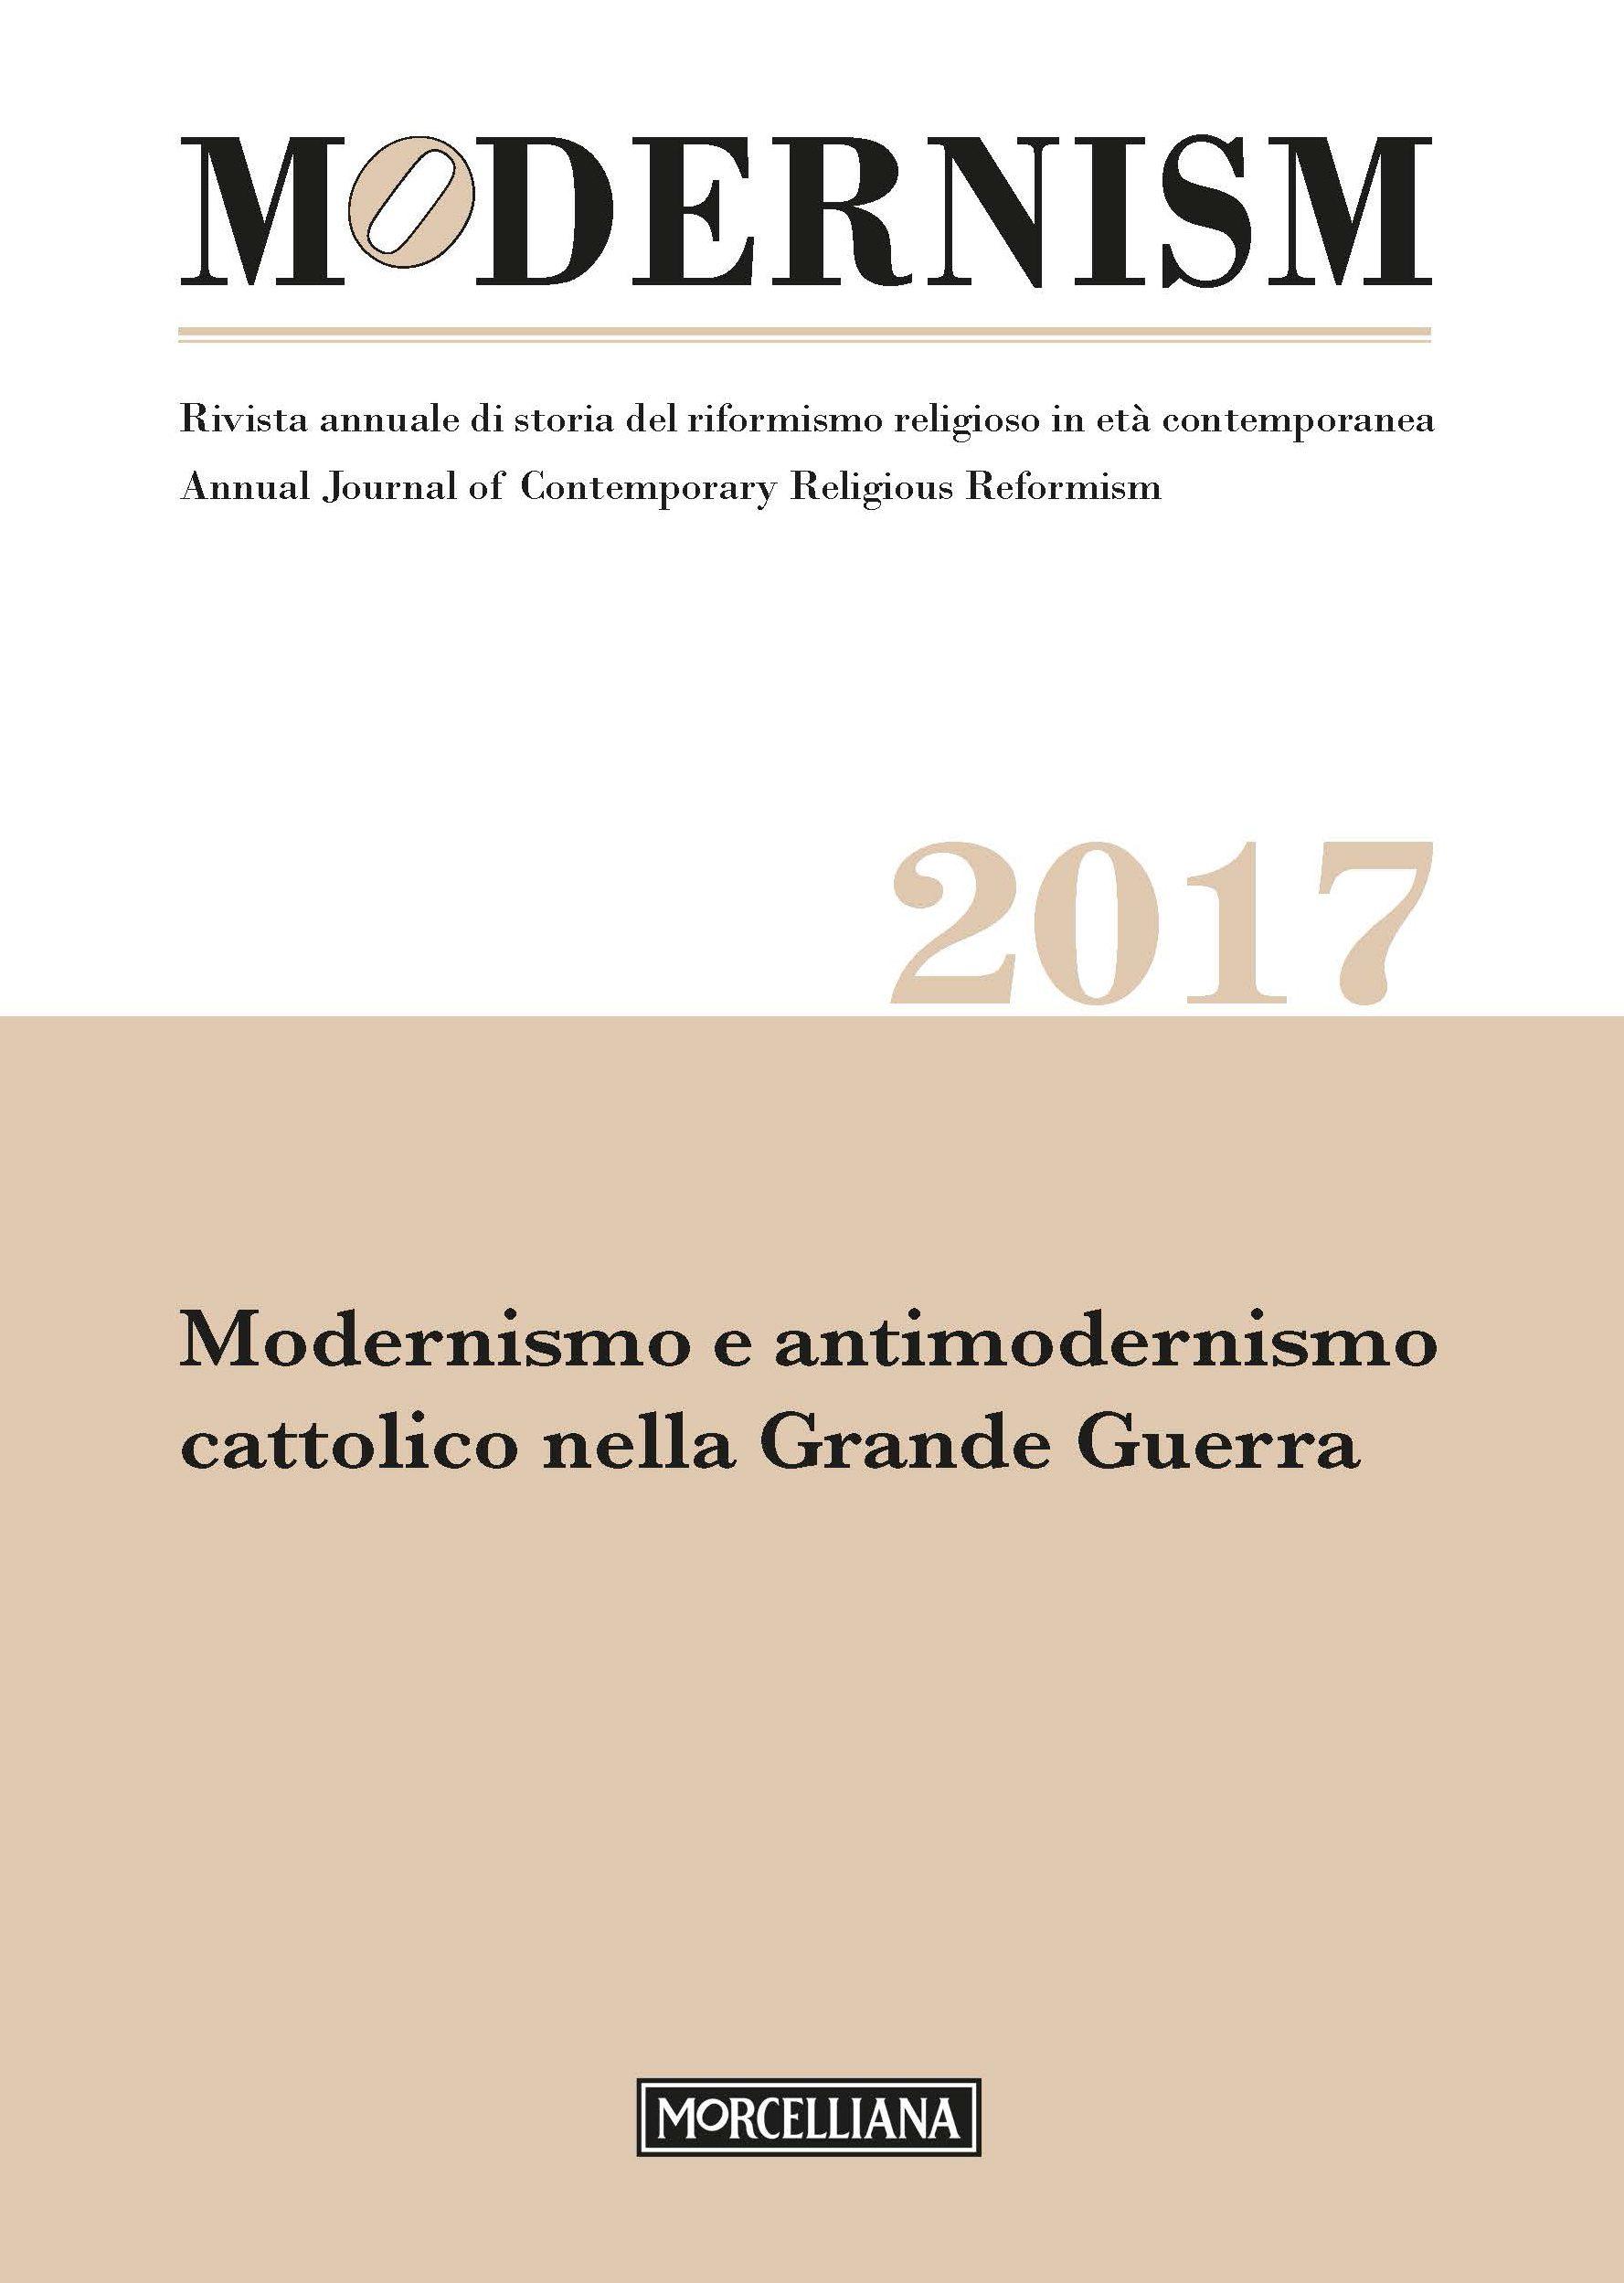 Copertina Modernism 2017.jpg